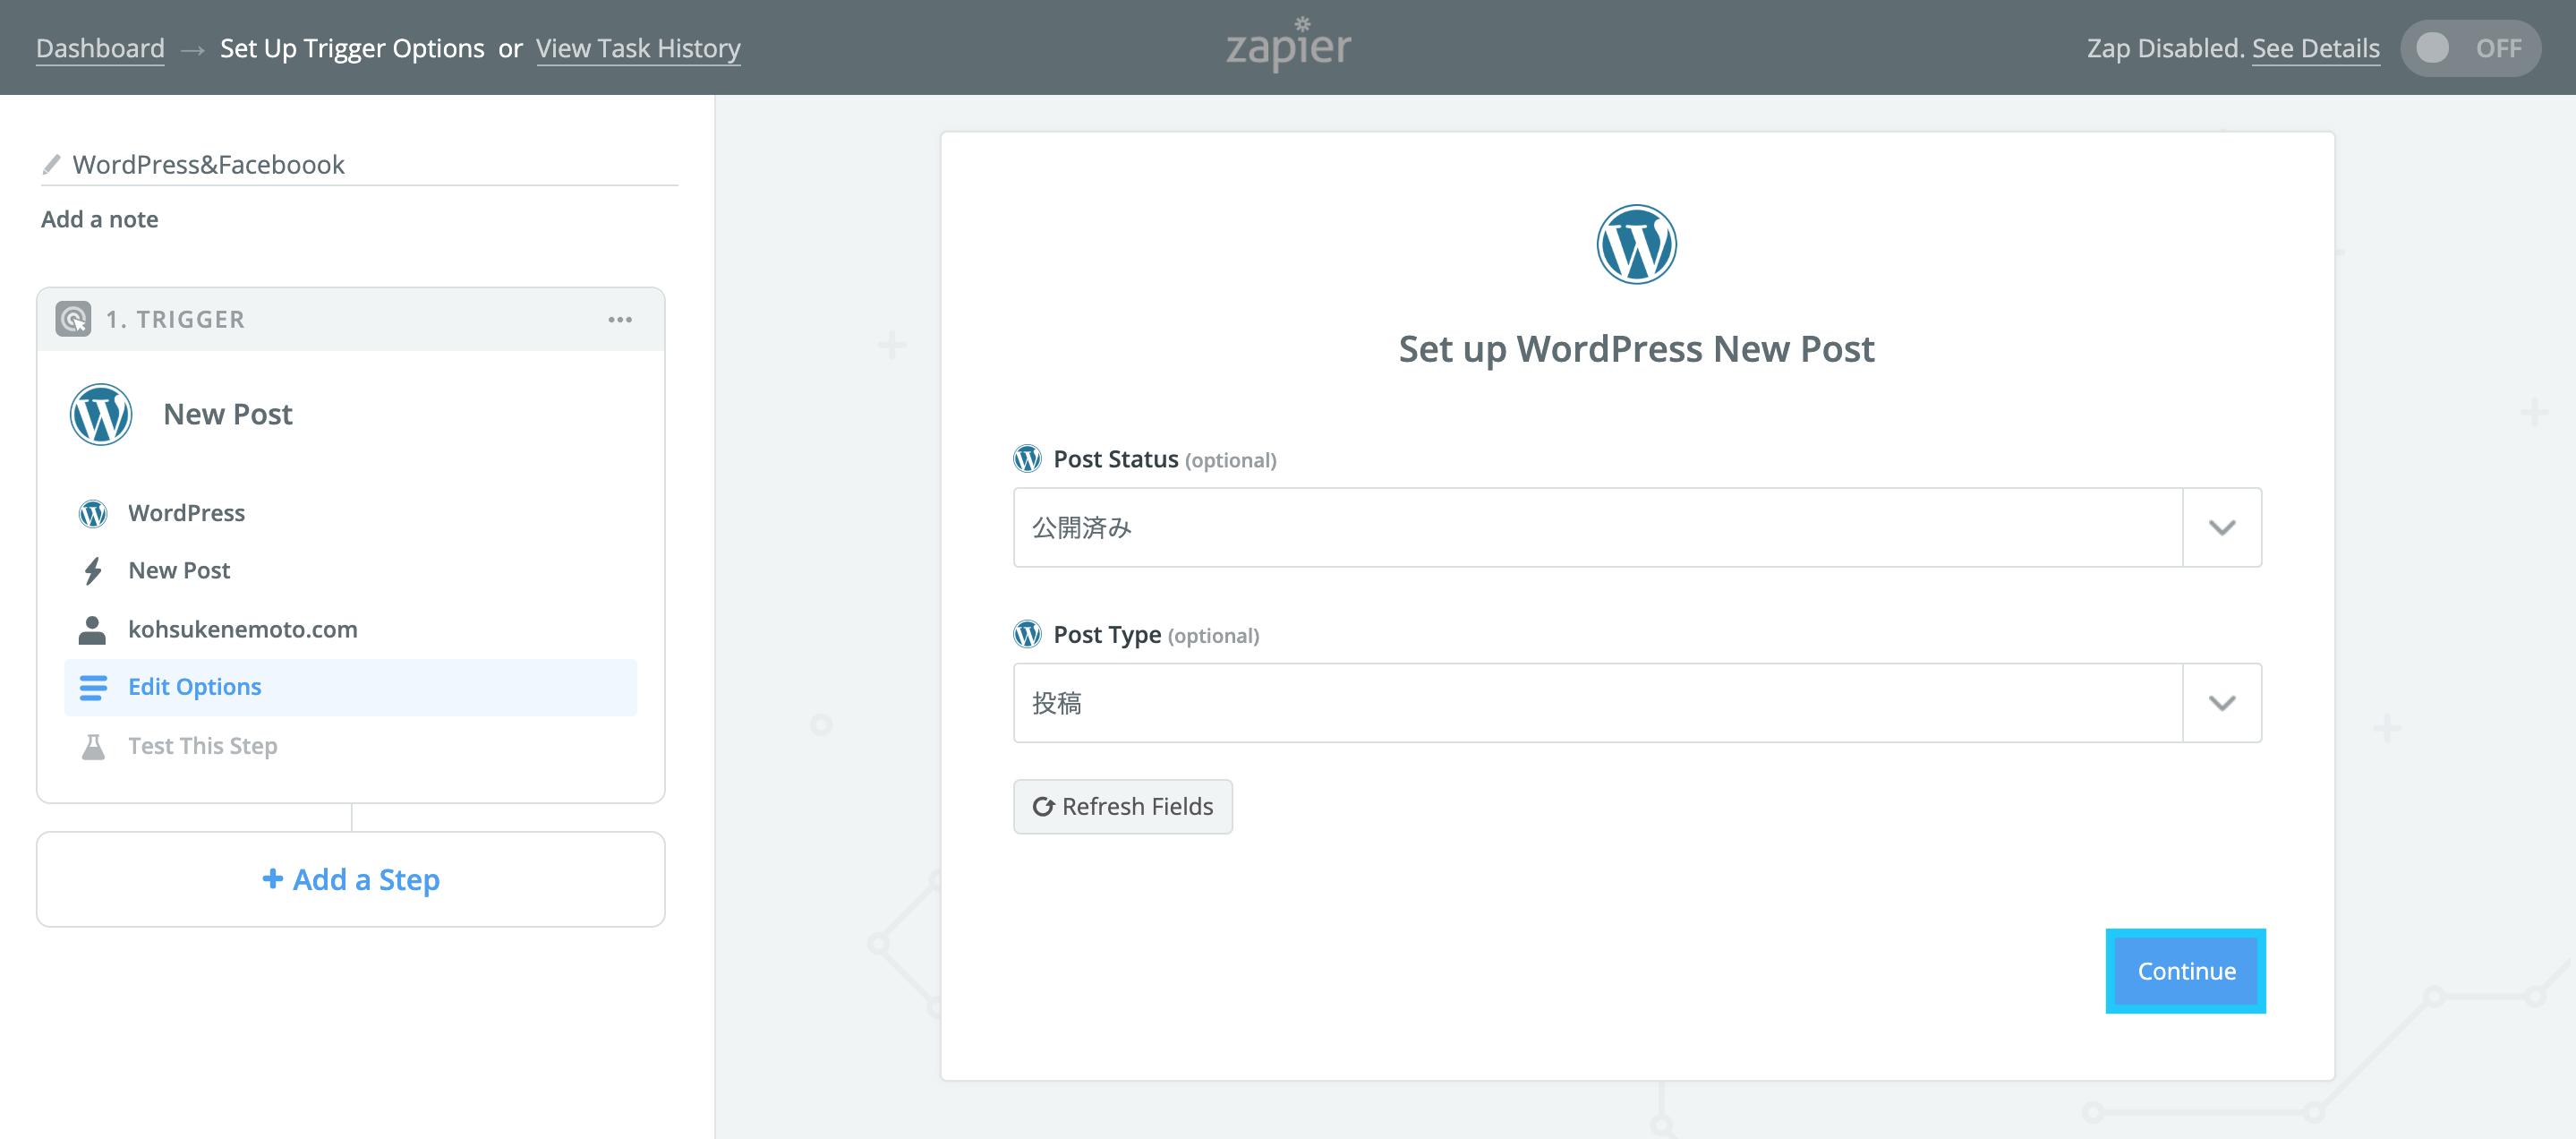 Zapierで「Set uo WordPress New Post」で「Post Status」と「Post Type」を選択する